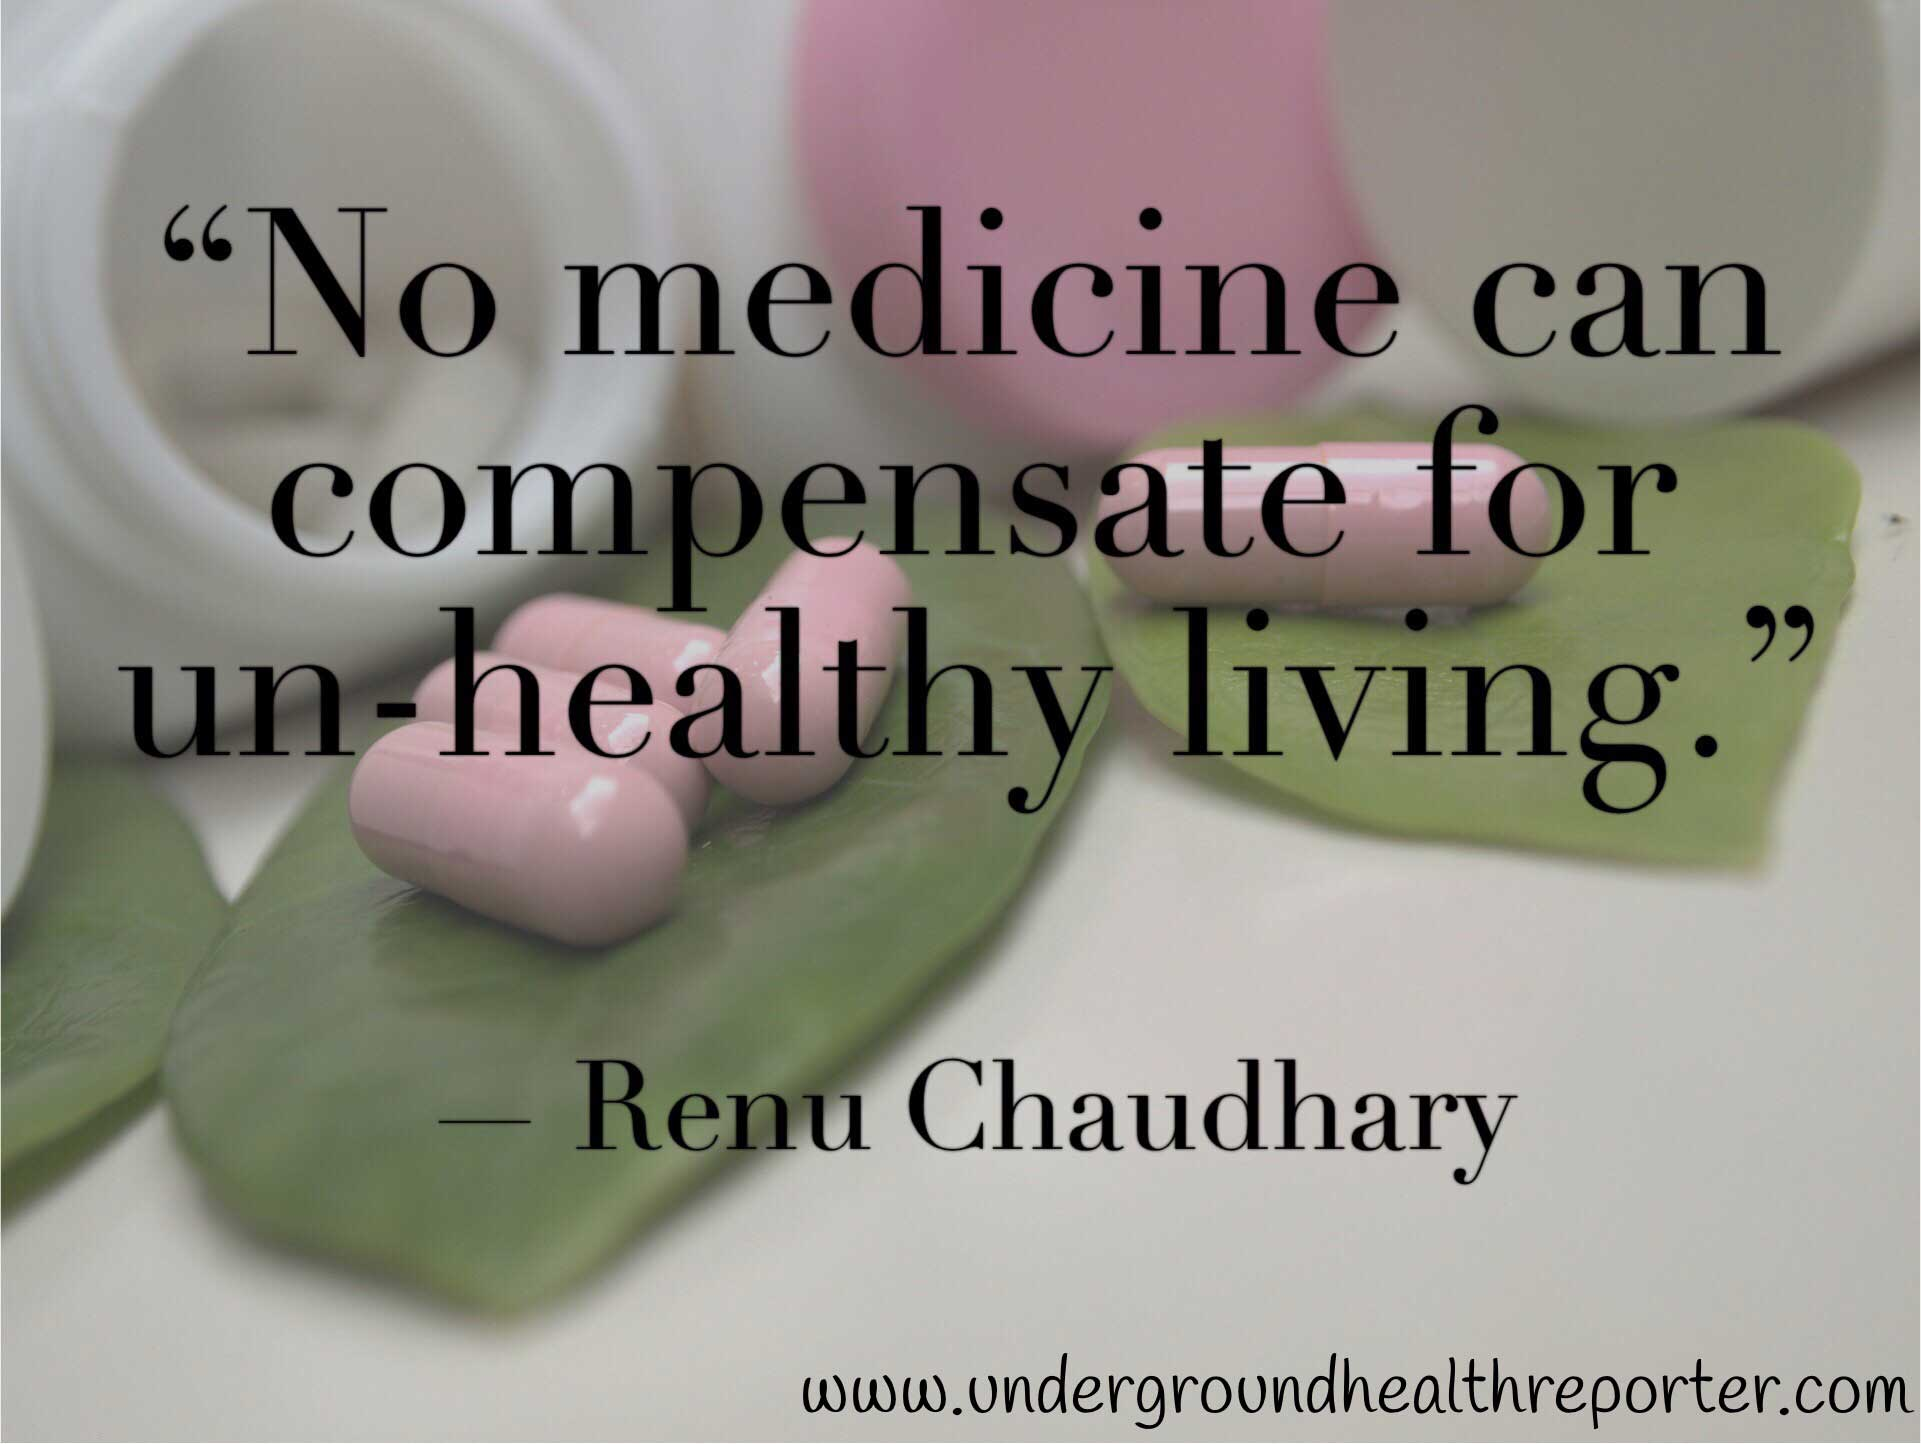 Renu Chaudhary quote